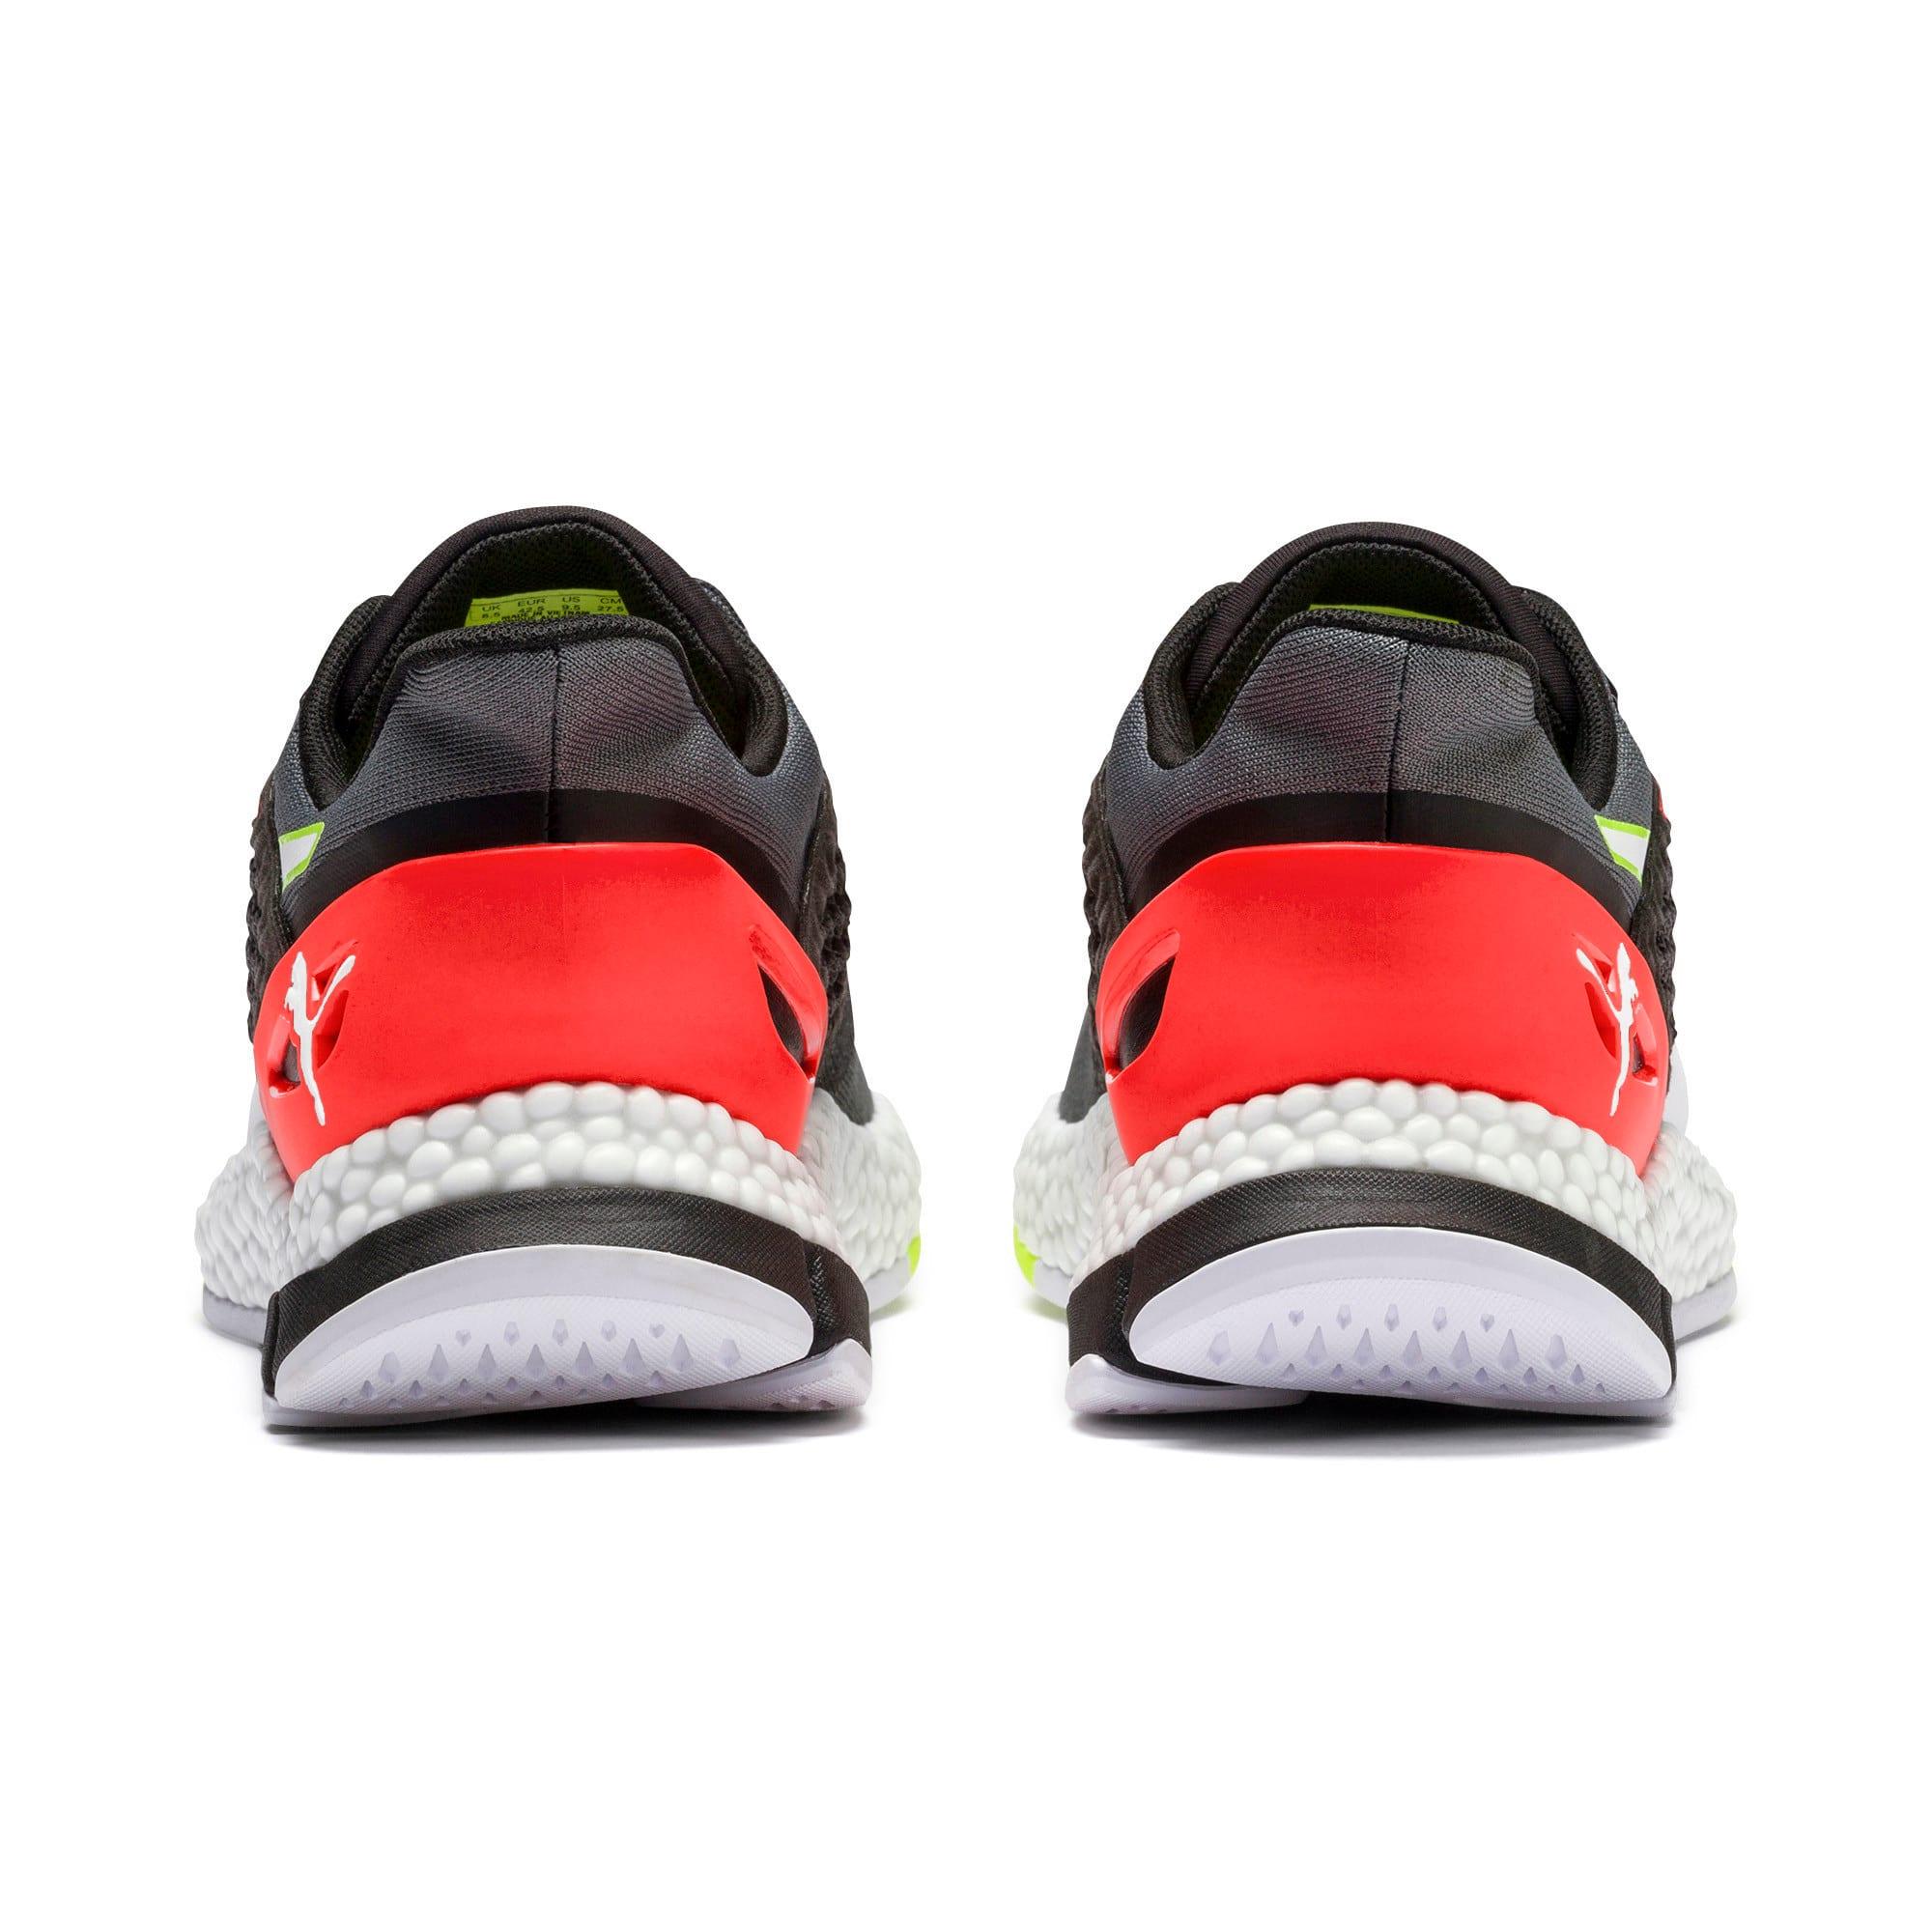 Thumbnail 7 of HYBRID NETFIT Astro Men's Running Shoes, CASTLEROCK-Puma Blck-Ngy Red, medium-IND